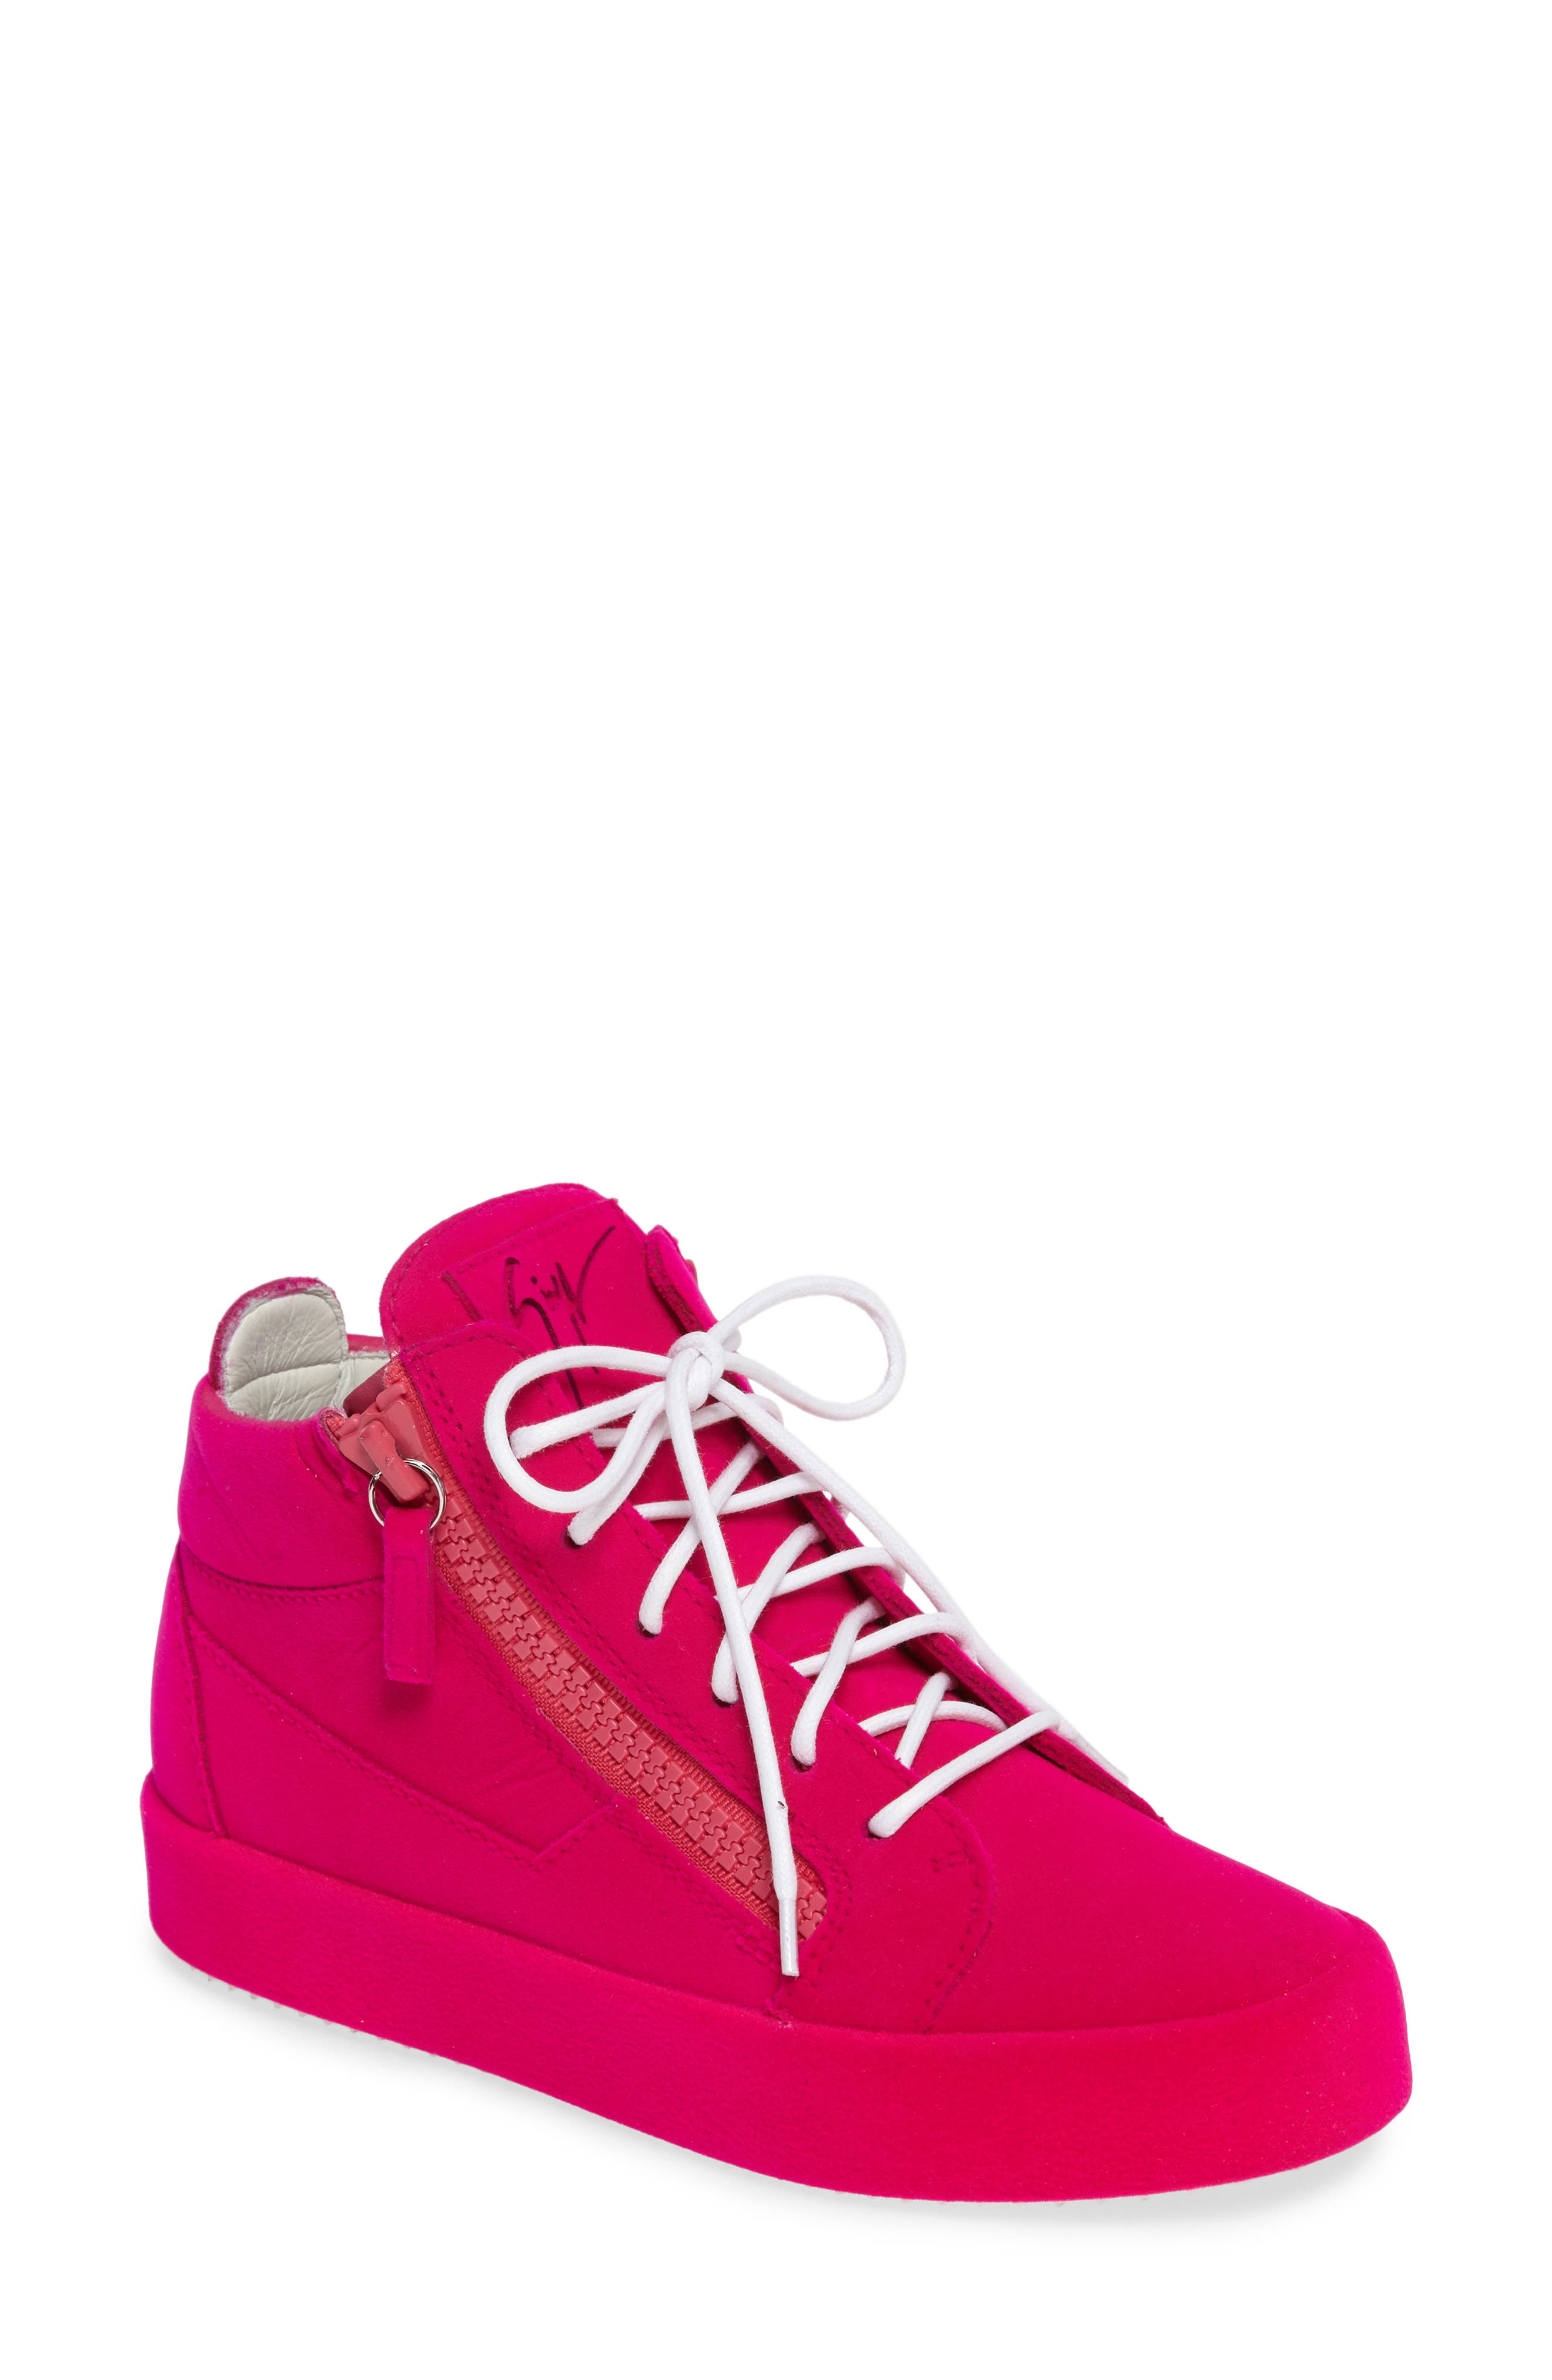 Main Image - Giuseppe Zanotti Zipper Sneaker (Women)